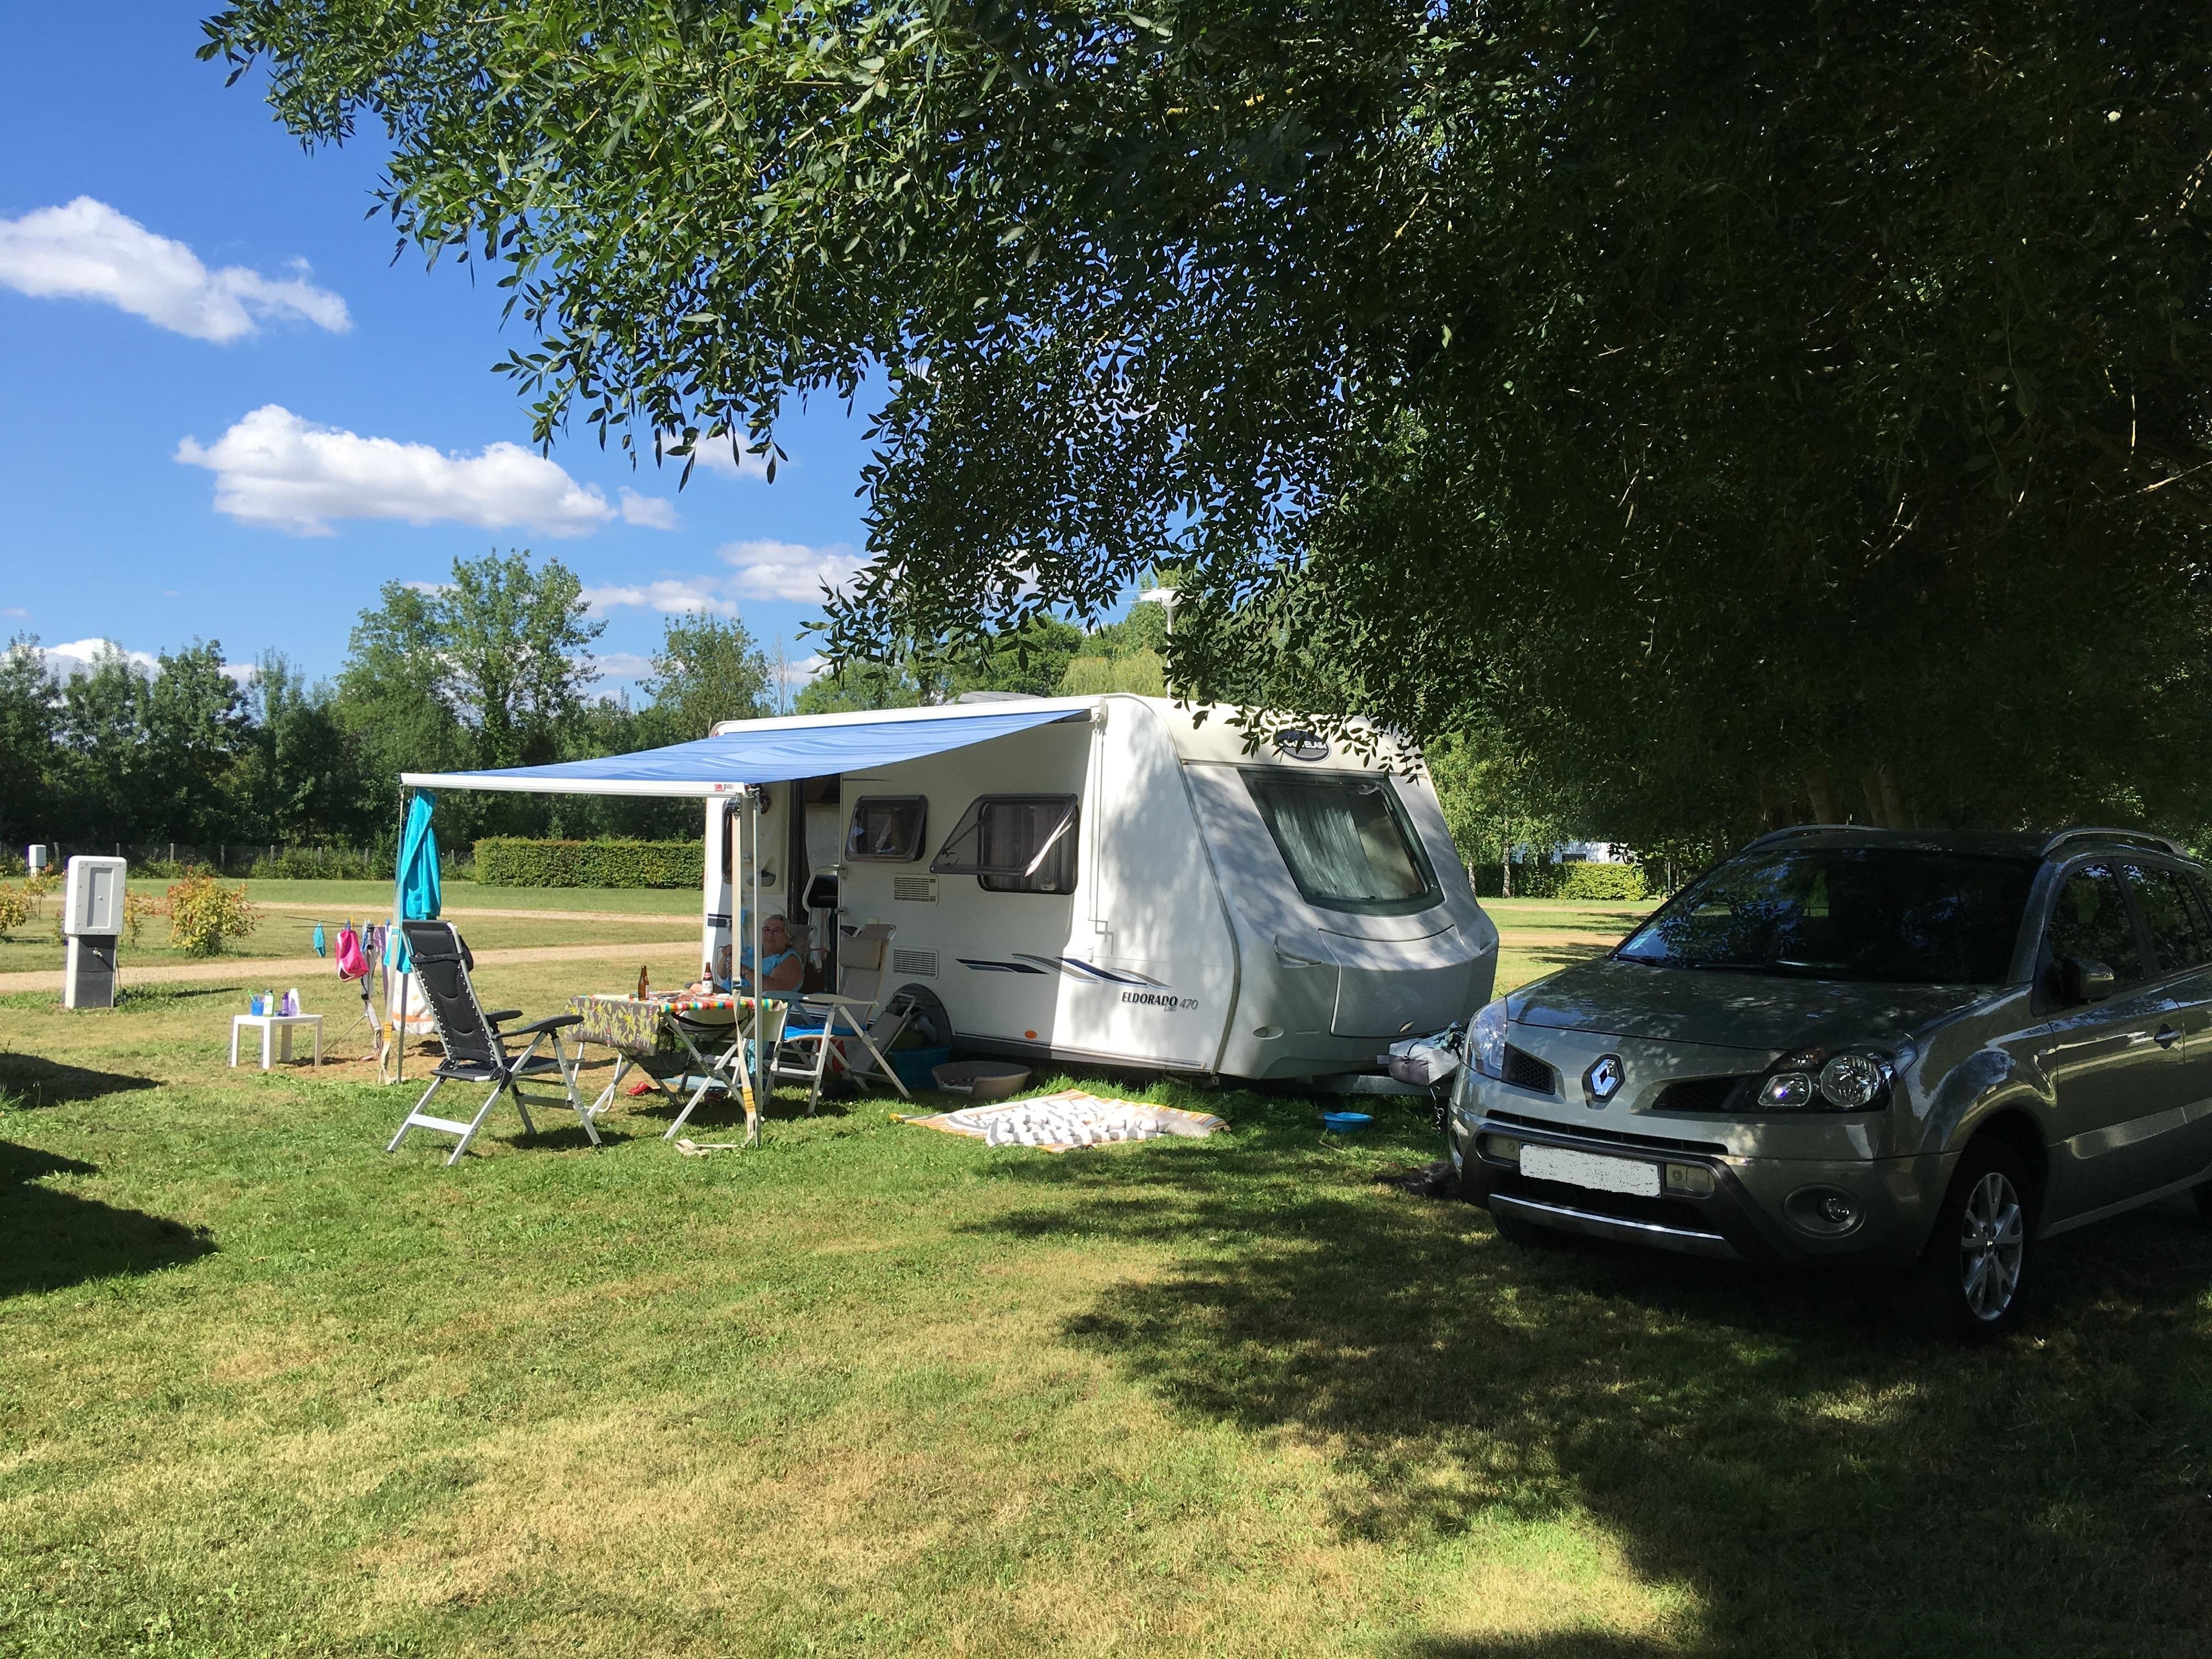 Camping le Moredena, Morannes, Maine-et-Loire